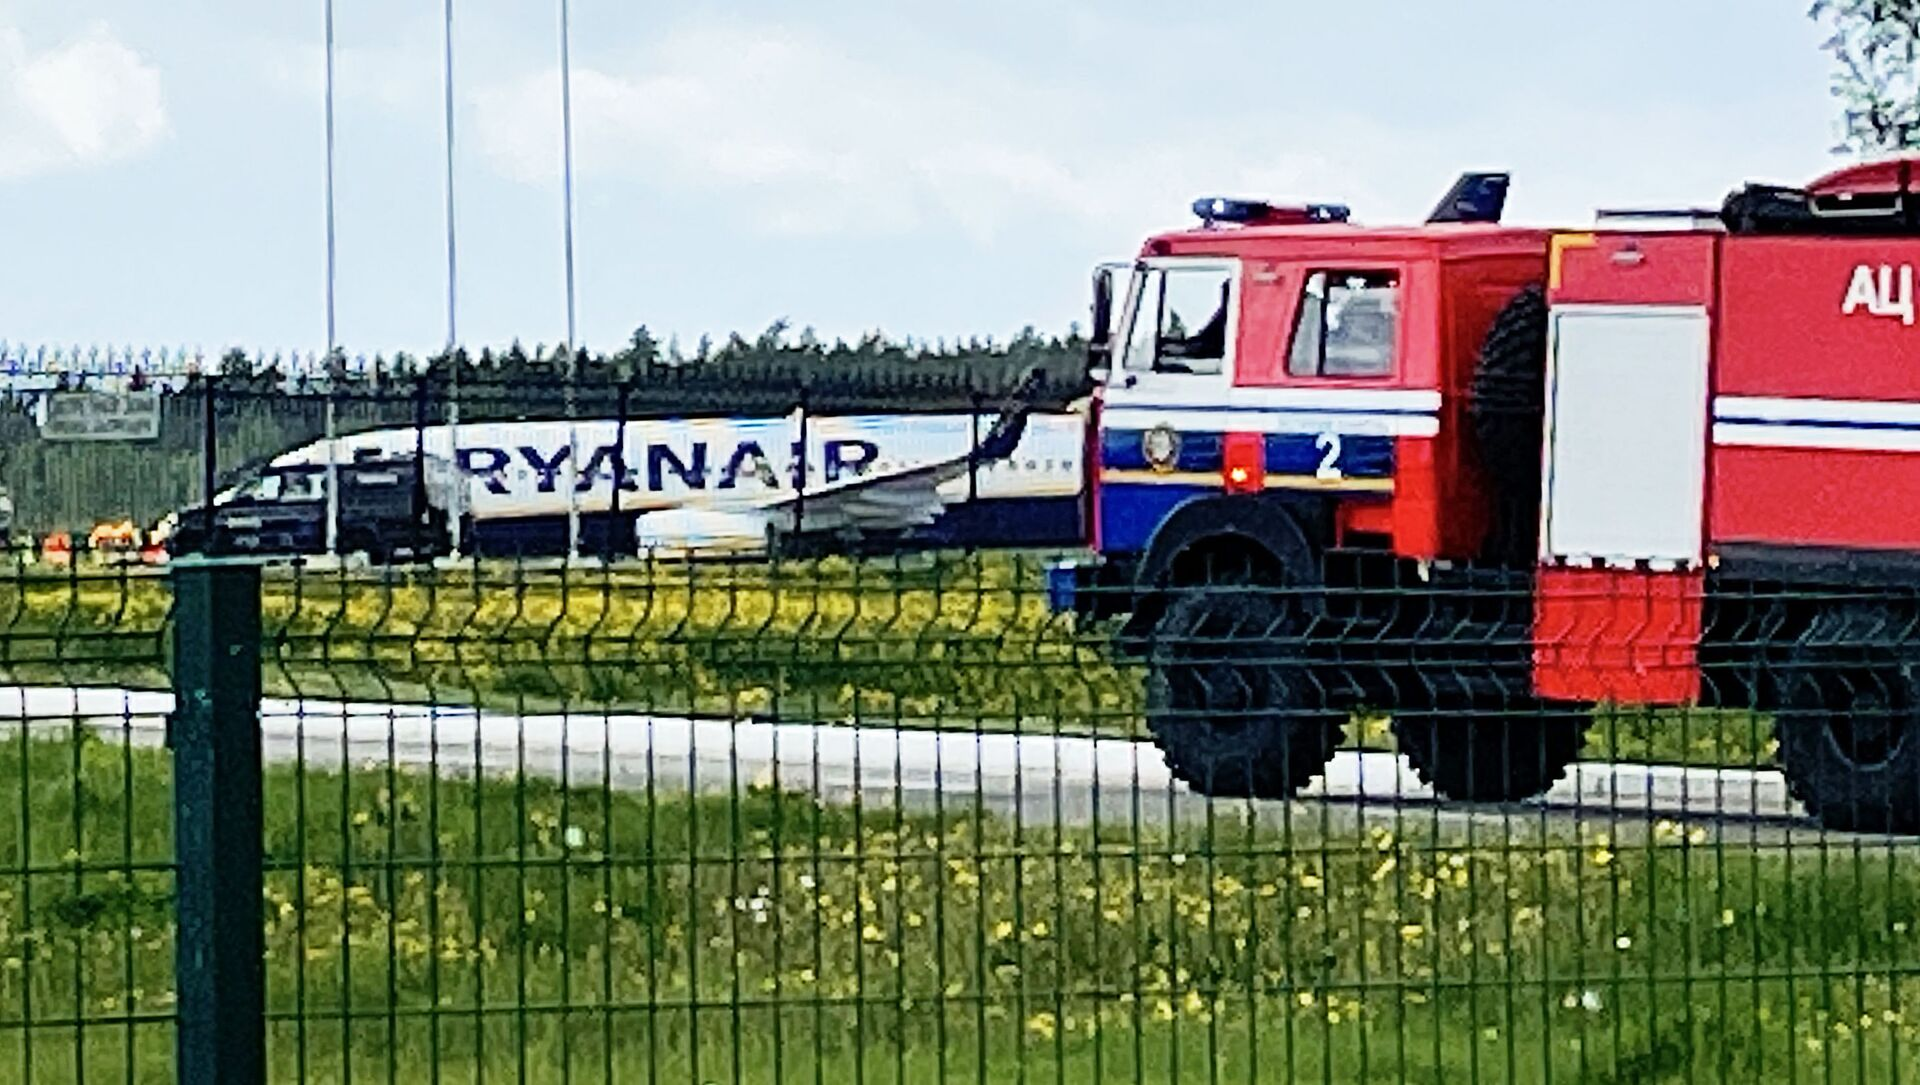 Samolot Ryanair w Mińsku - Sputnik Polska, 1920, 28.05.2021